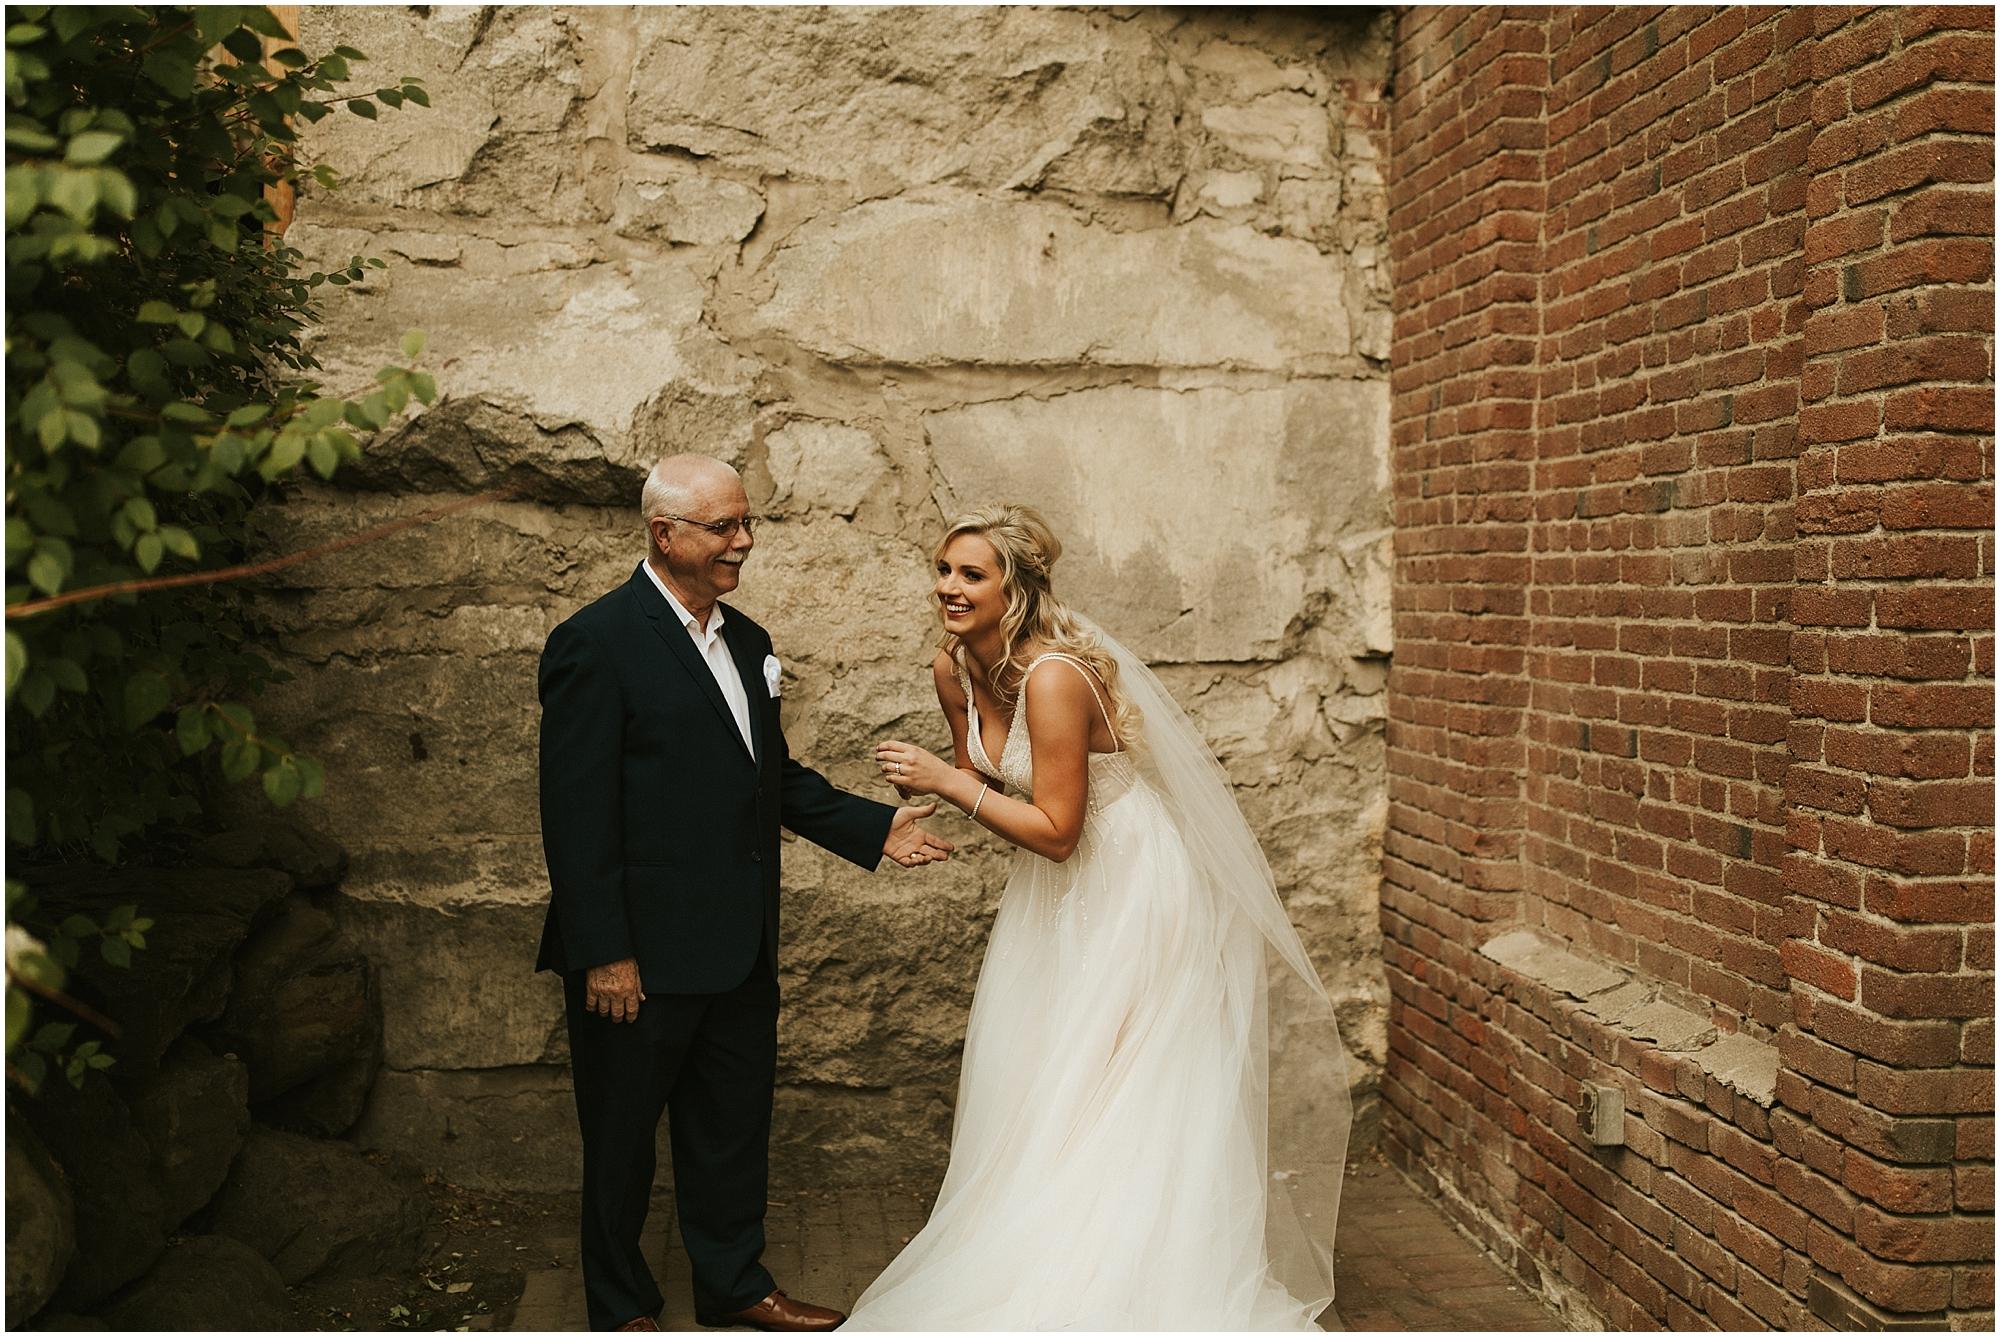 Chateau Rive Spokane Wedding Cassie Trottier Photography1009.jpg